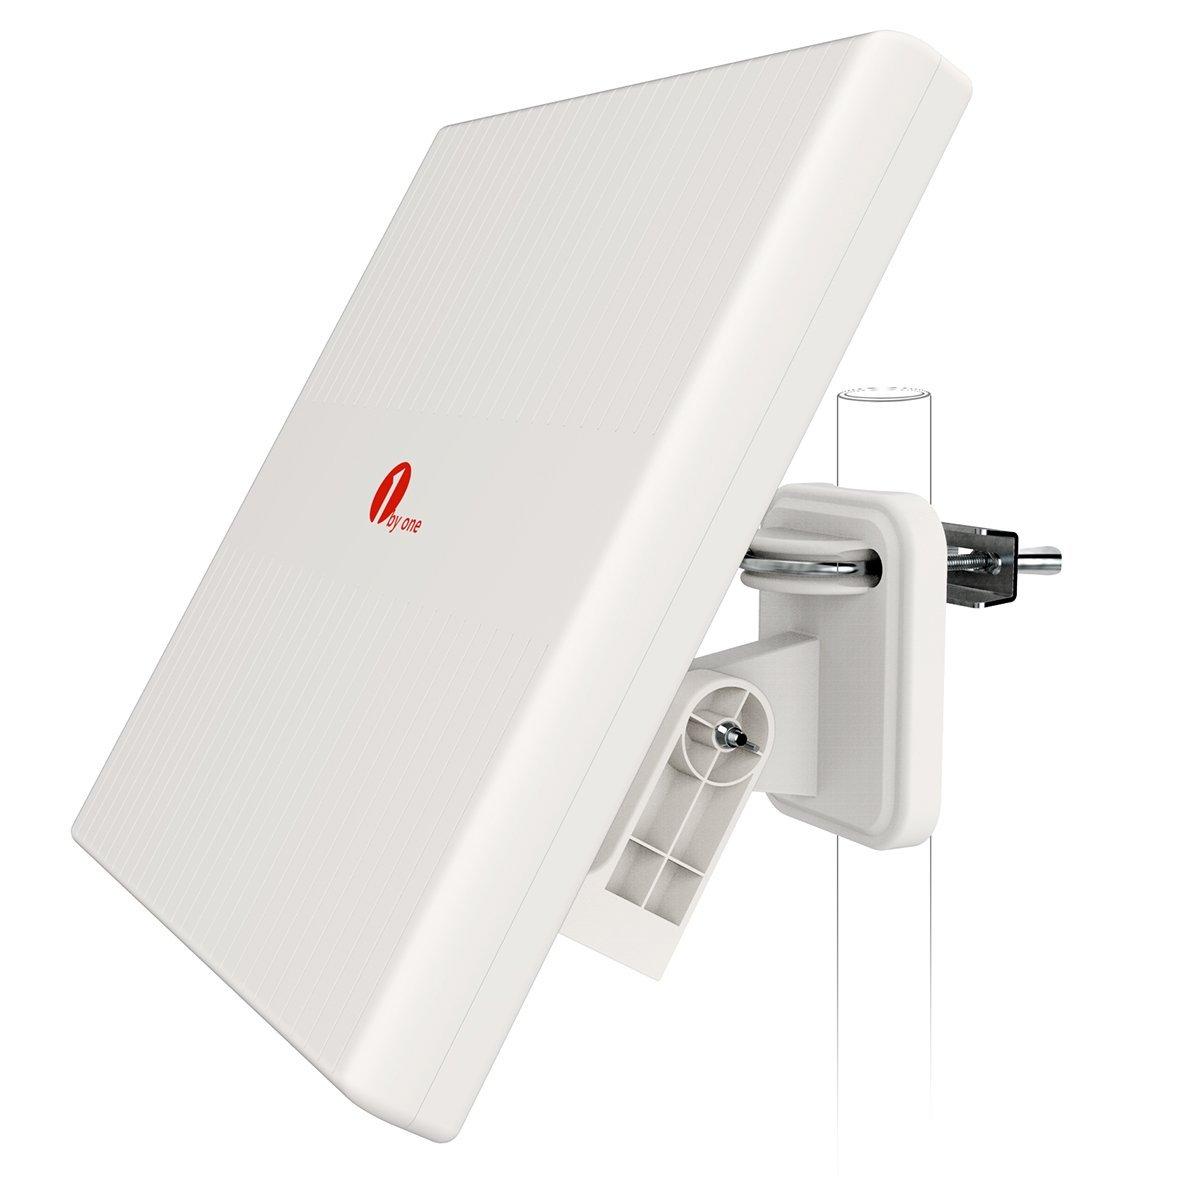 1byone Omni Directional Outdoor Antenna 60 Miles Range